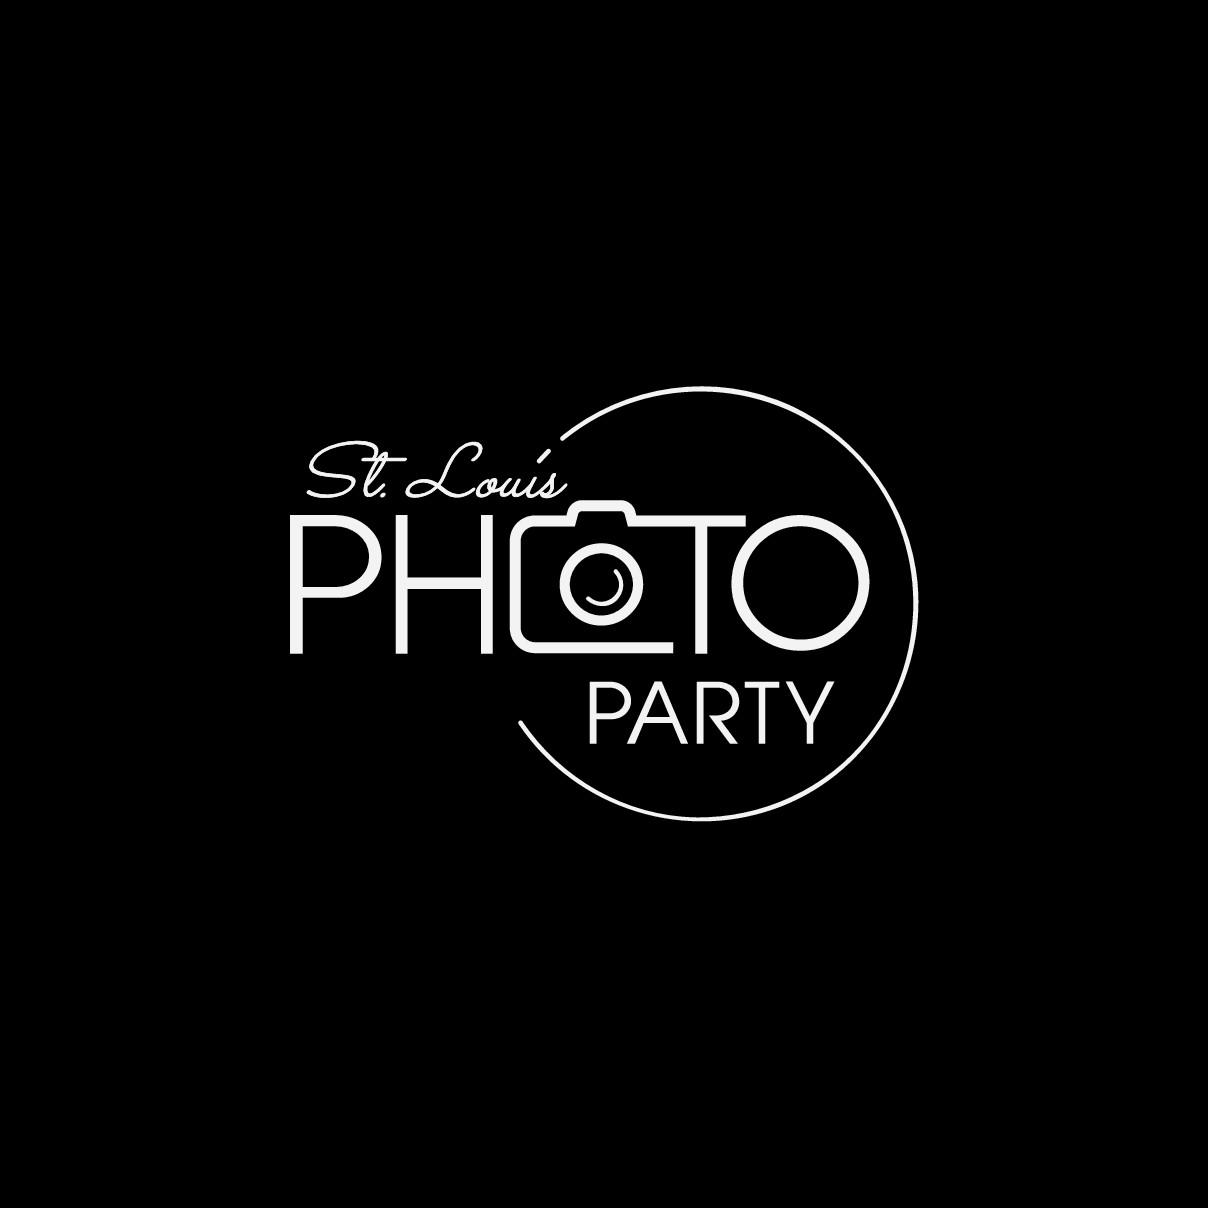 Simple photography logo